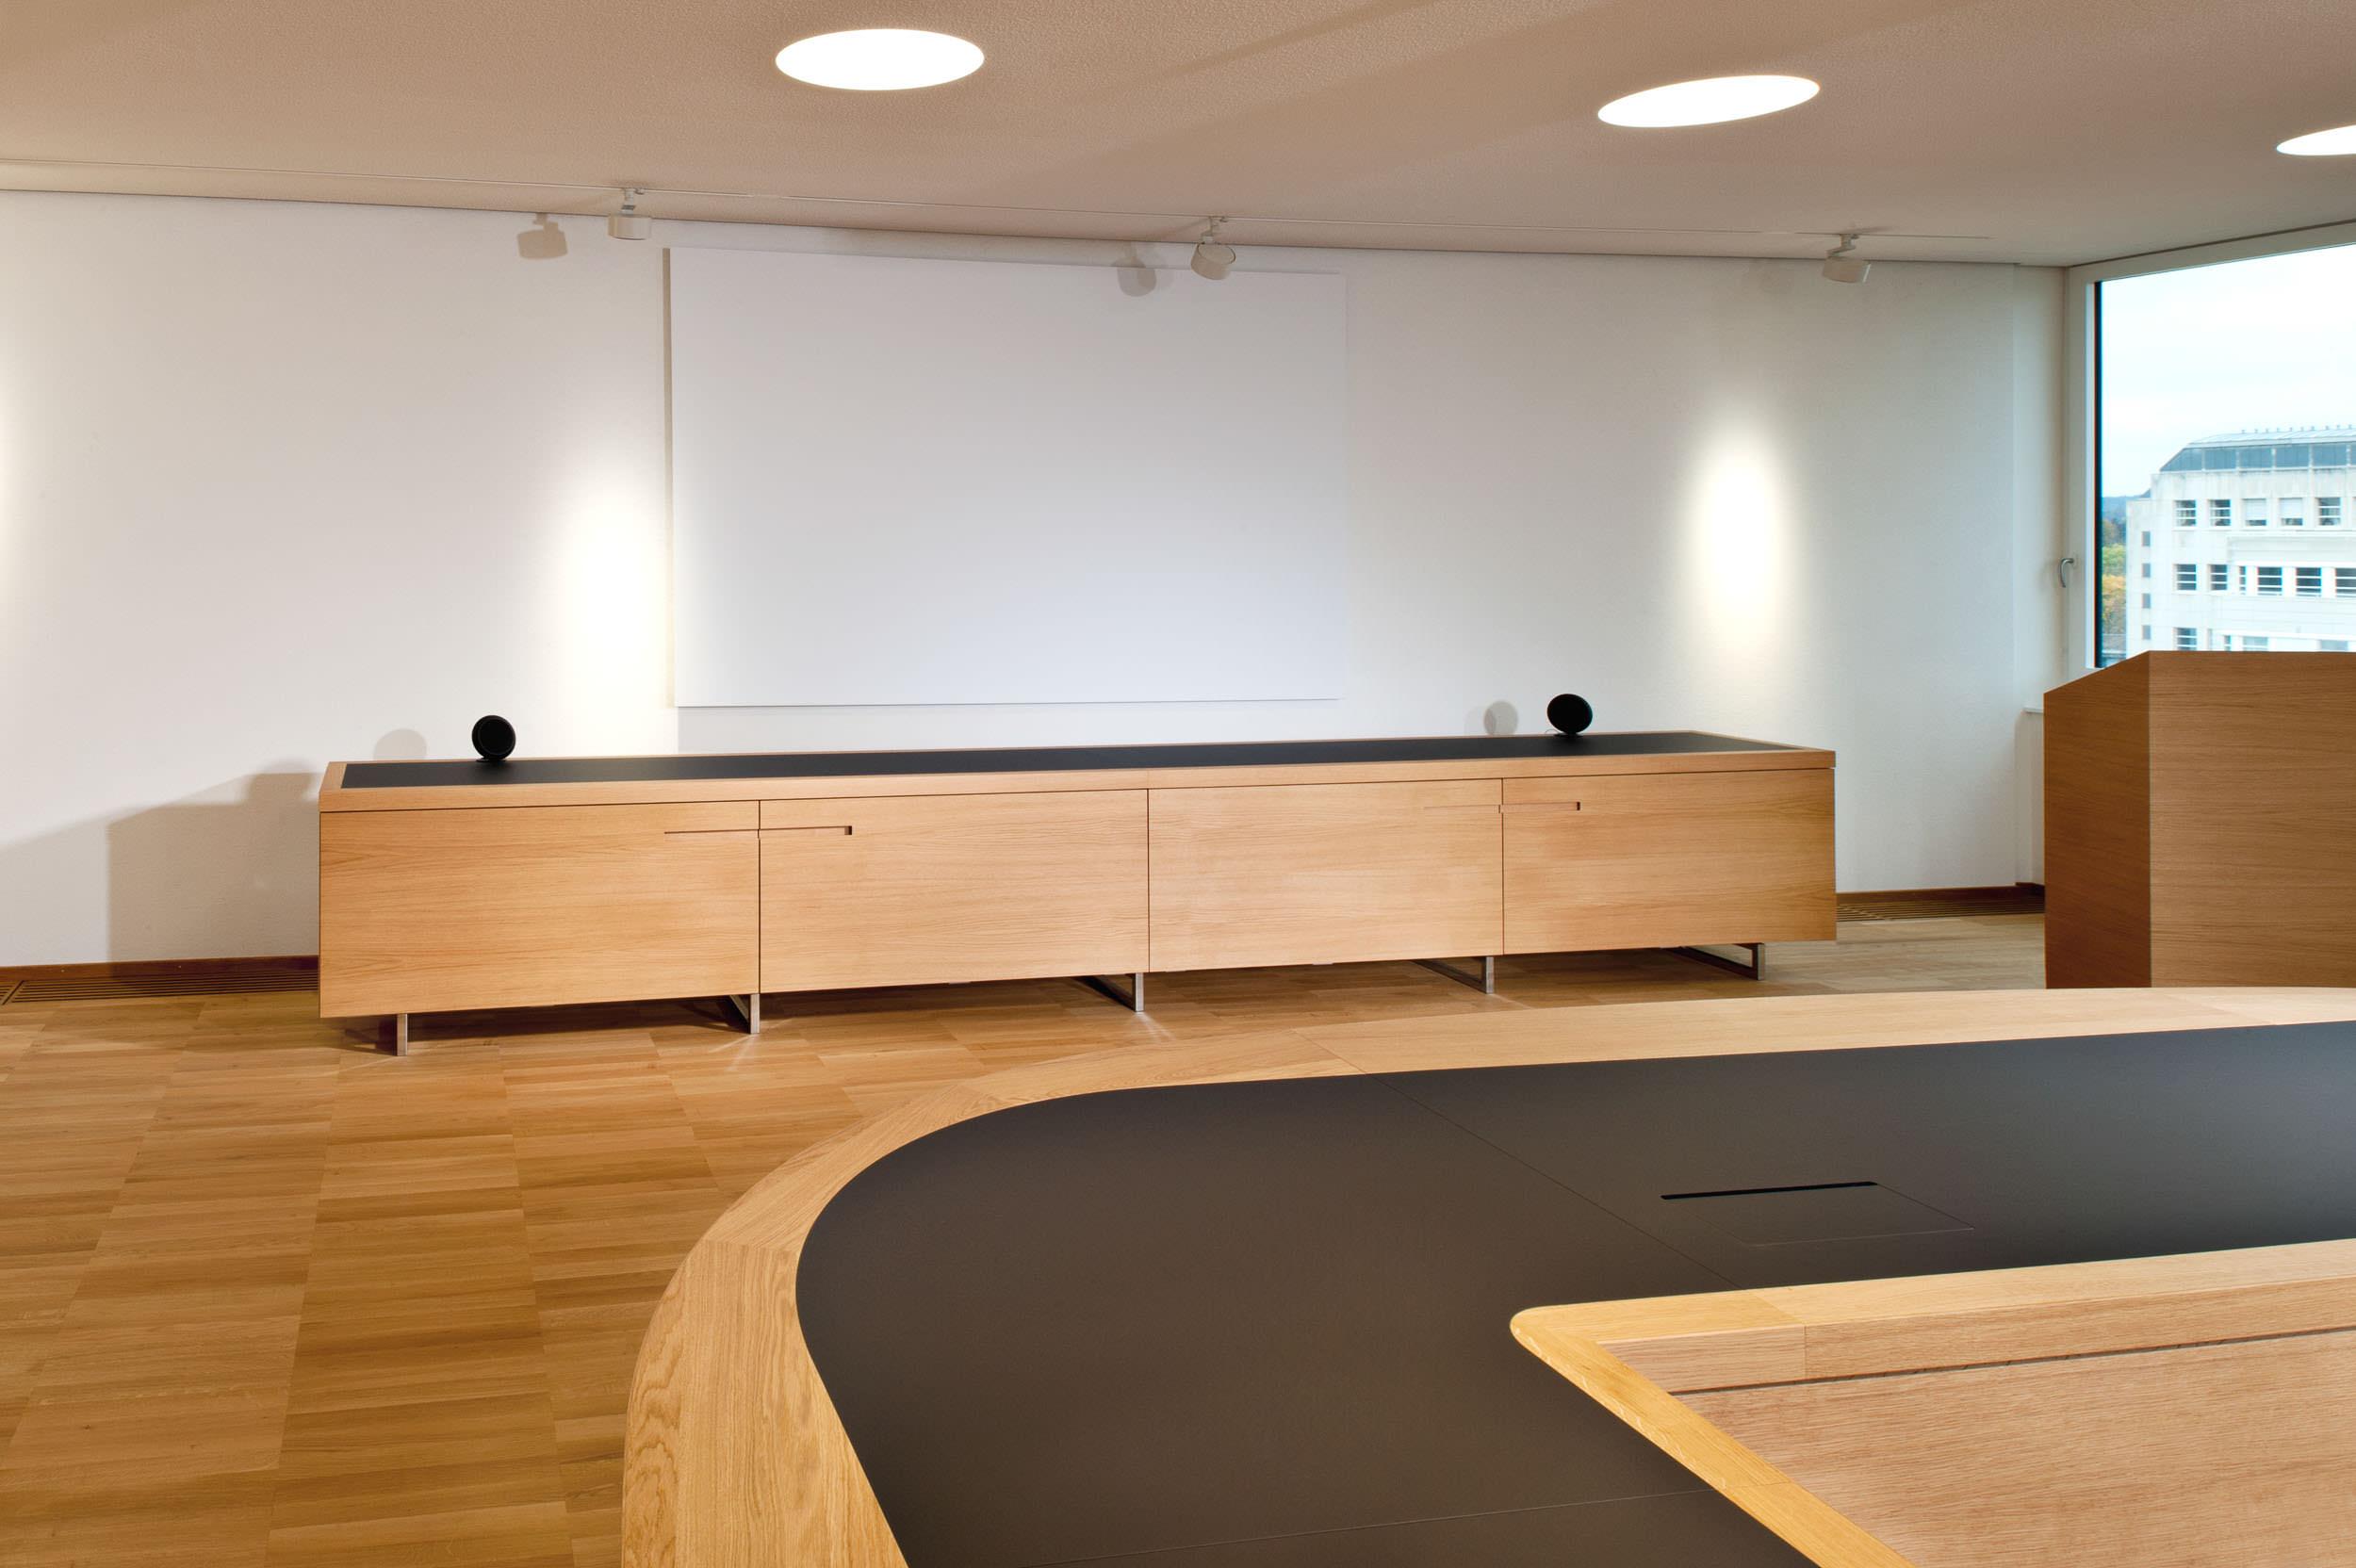 Bersicht zurbuchen ag amlikon objekt raum design for Raum design